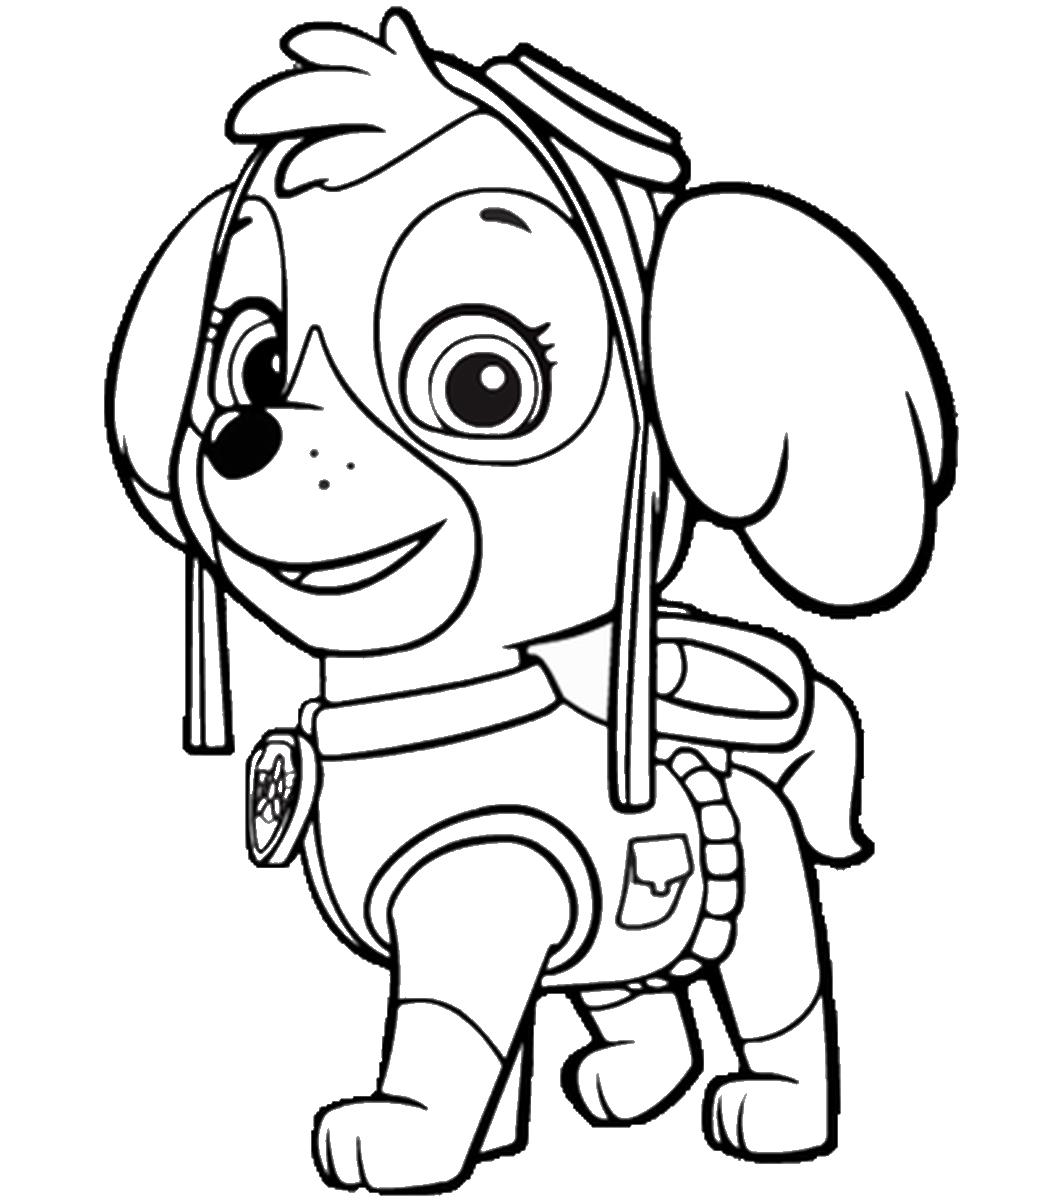 paw patrol coloring pages free top 10 paw patrol coloring pages of 2017 coloring paw free pages patrol